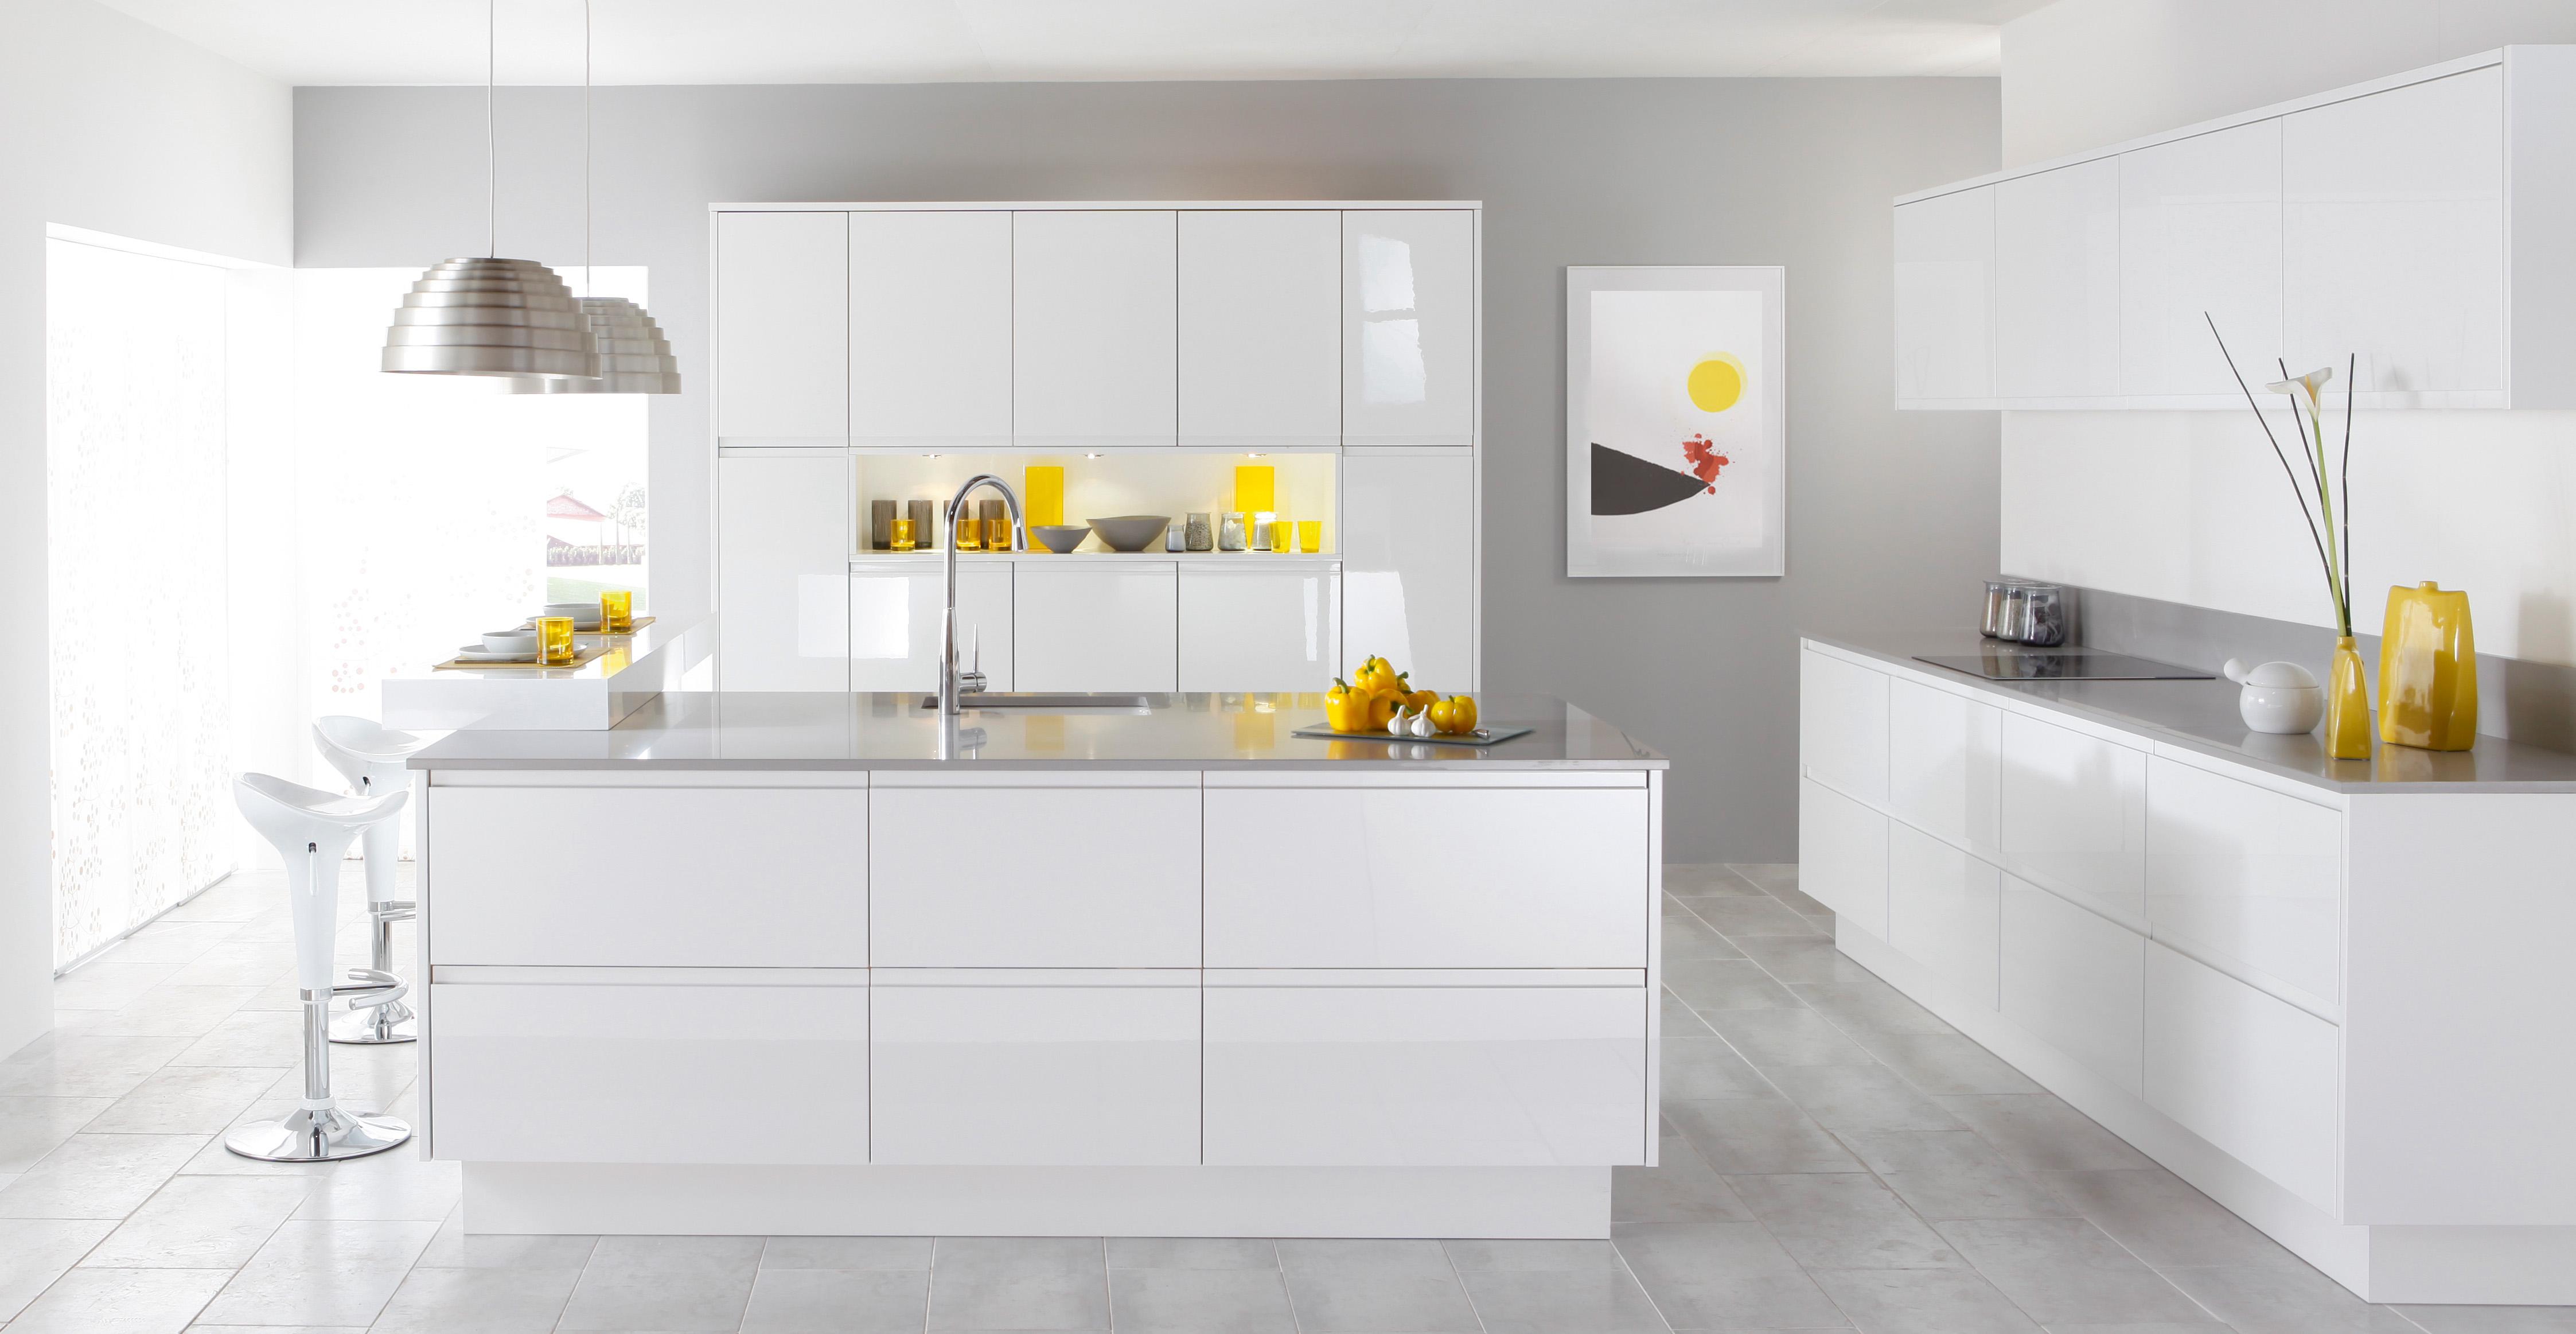 Vermonhouzz 2019 Modern White High Gloss Lacquer Handleless Kitchen Cabinet Design Hotel Kitchen Buy White High Gloss Kitchen Cabinet Handleless Kitchen Cabinet Design Hotel Kitchen Product On Alibaba Com